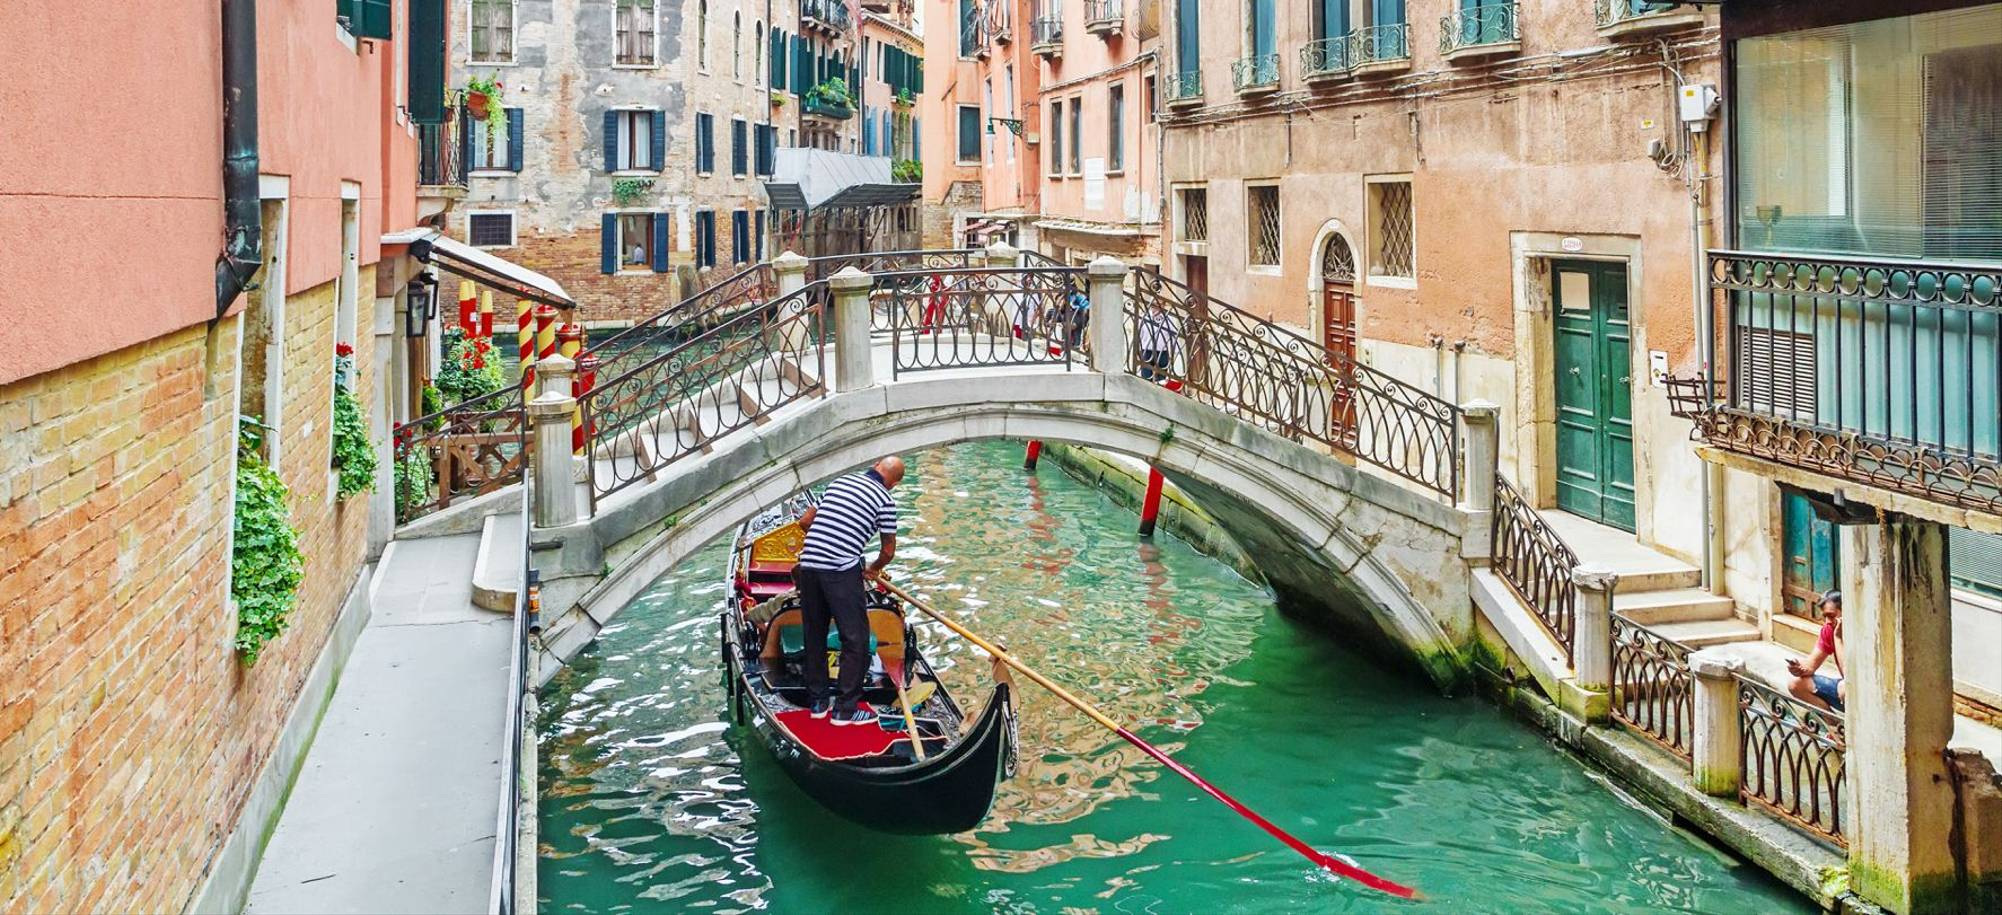 Venice2   Gondola   Itinerary Desktop